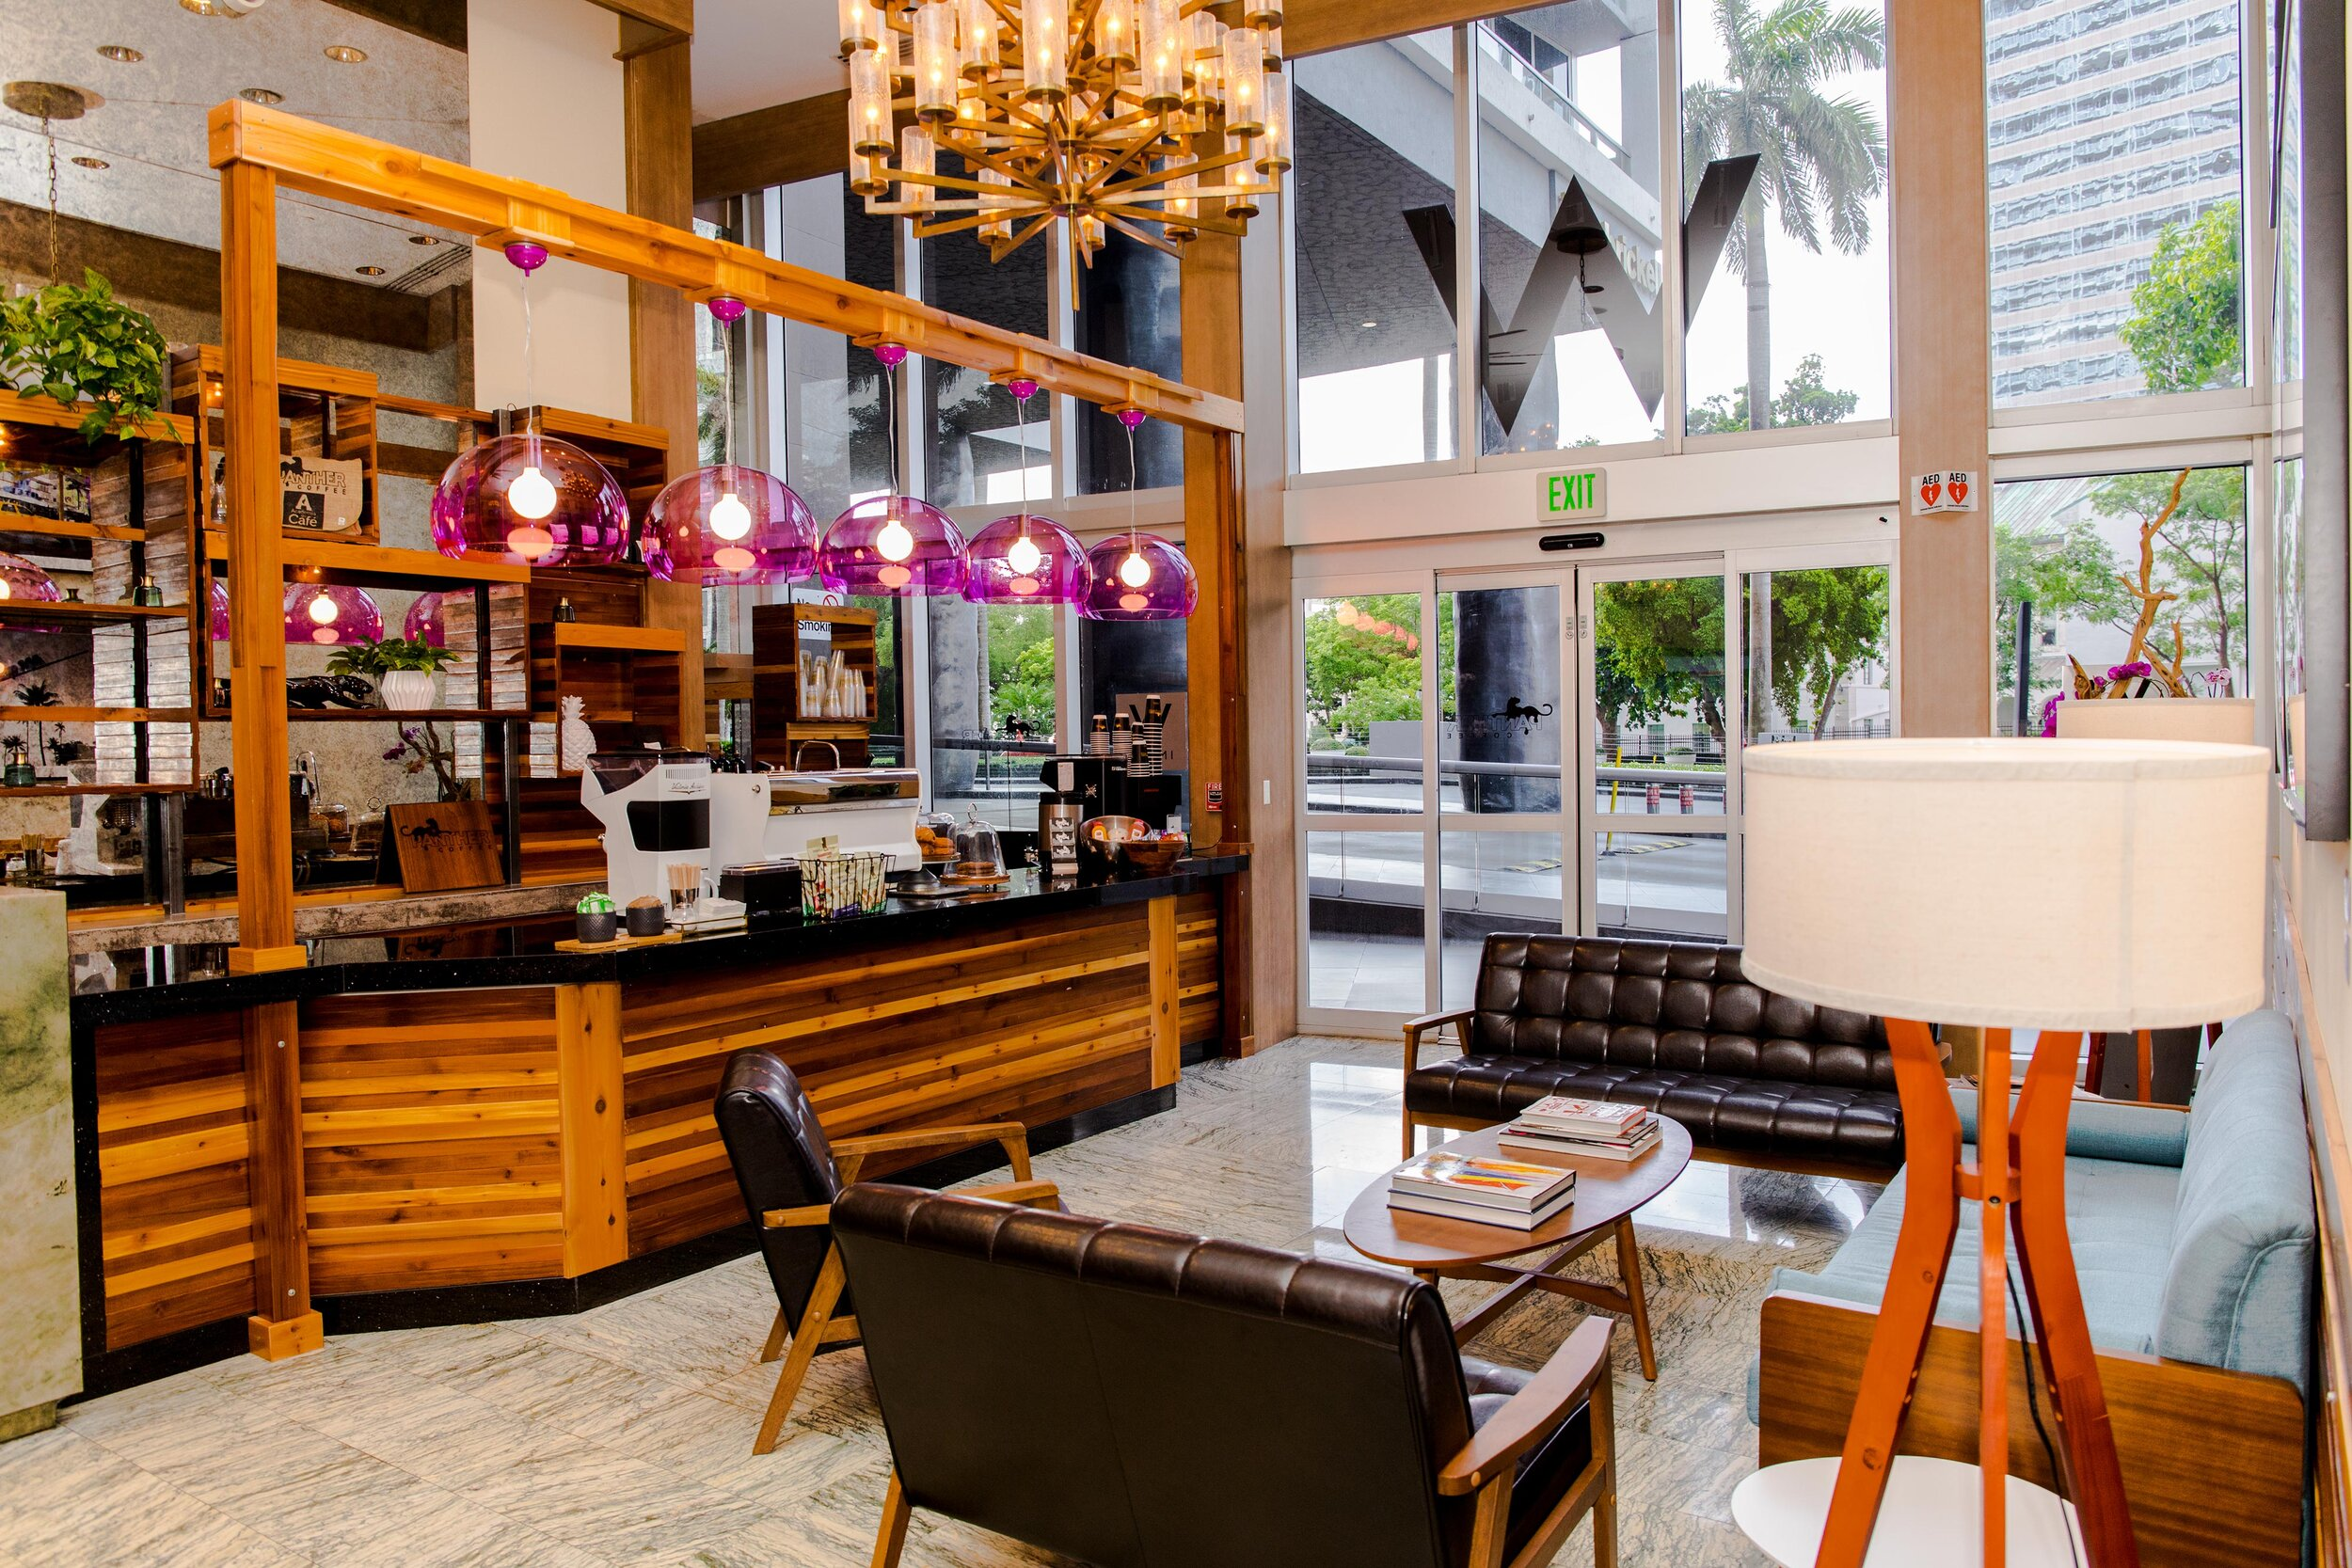 cafe-panther-coffee-w-miami-icon-brickell_lipstickandchicspaces.com.jpg